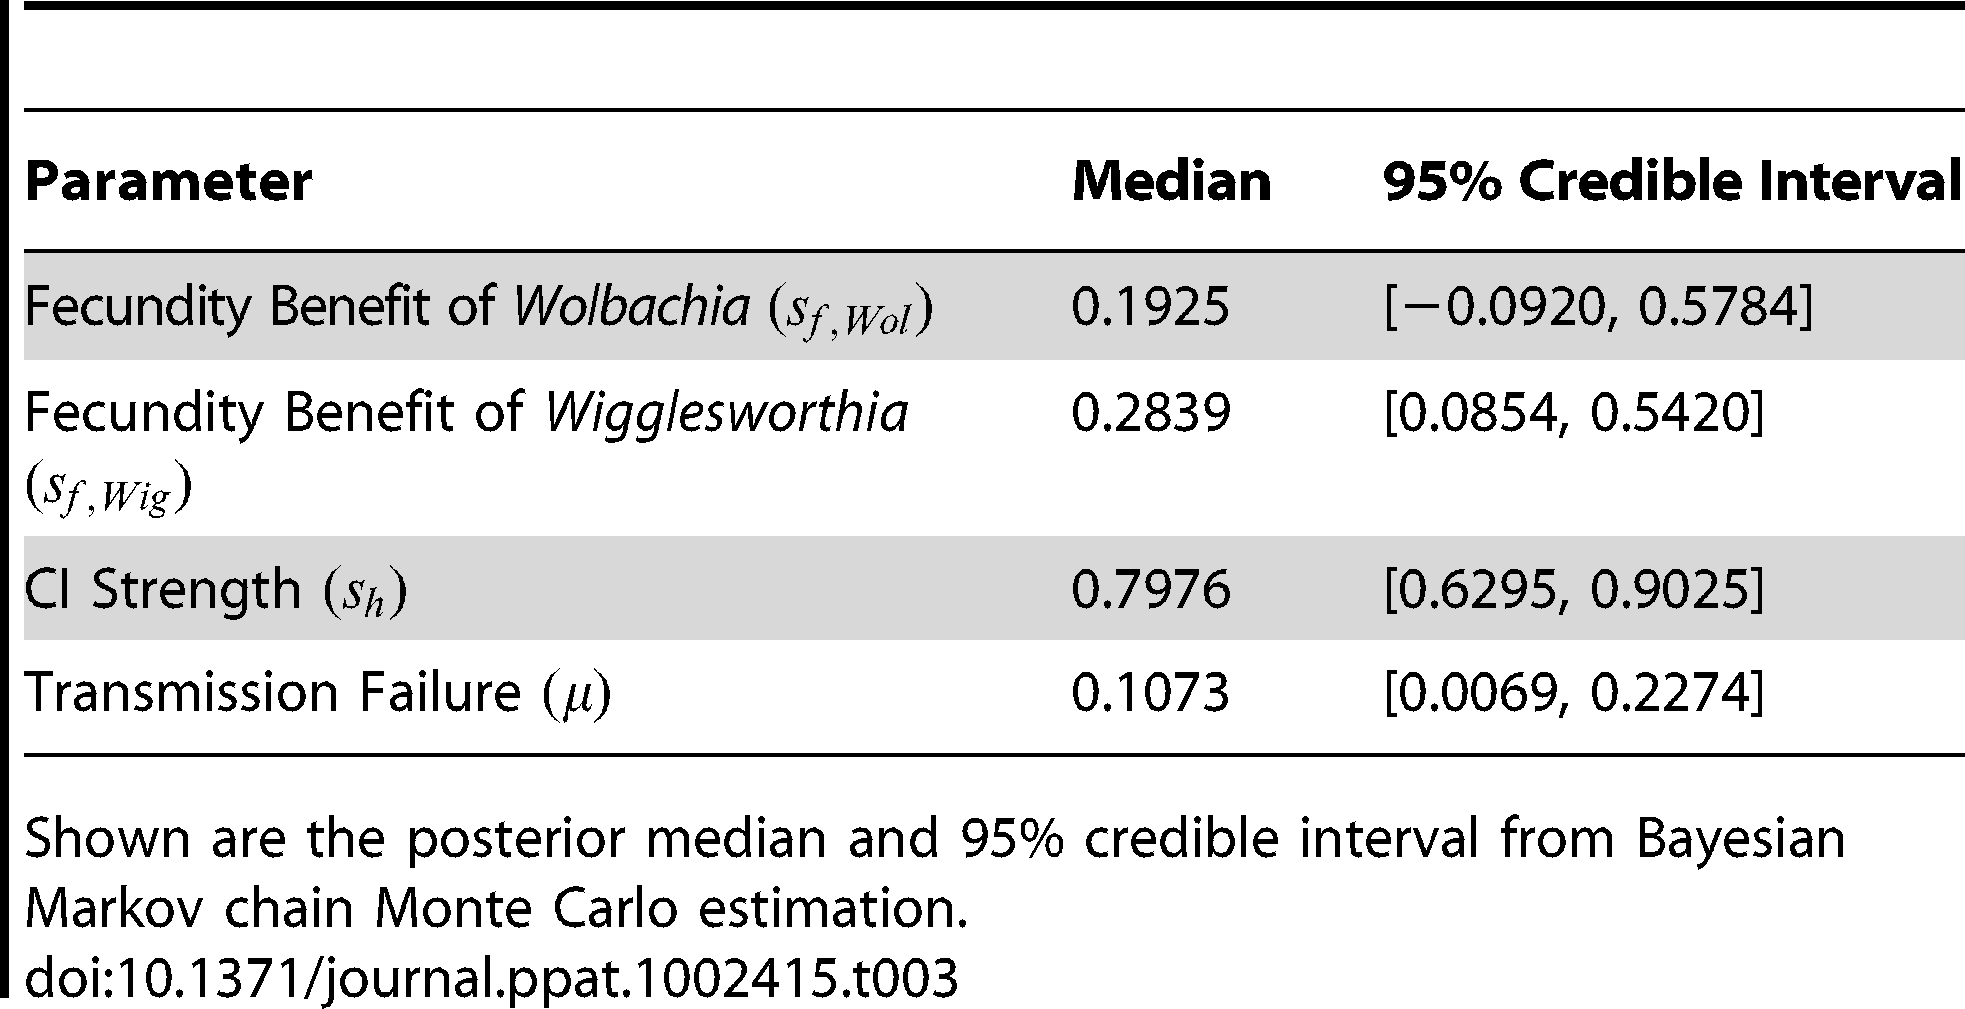 Cytoplasmic-incompatibility parameter estimates.